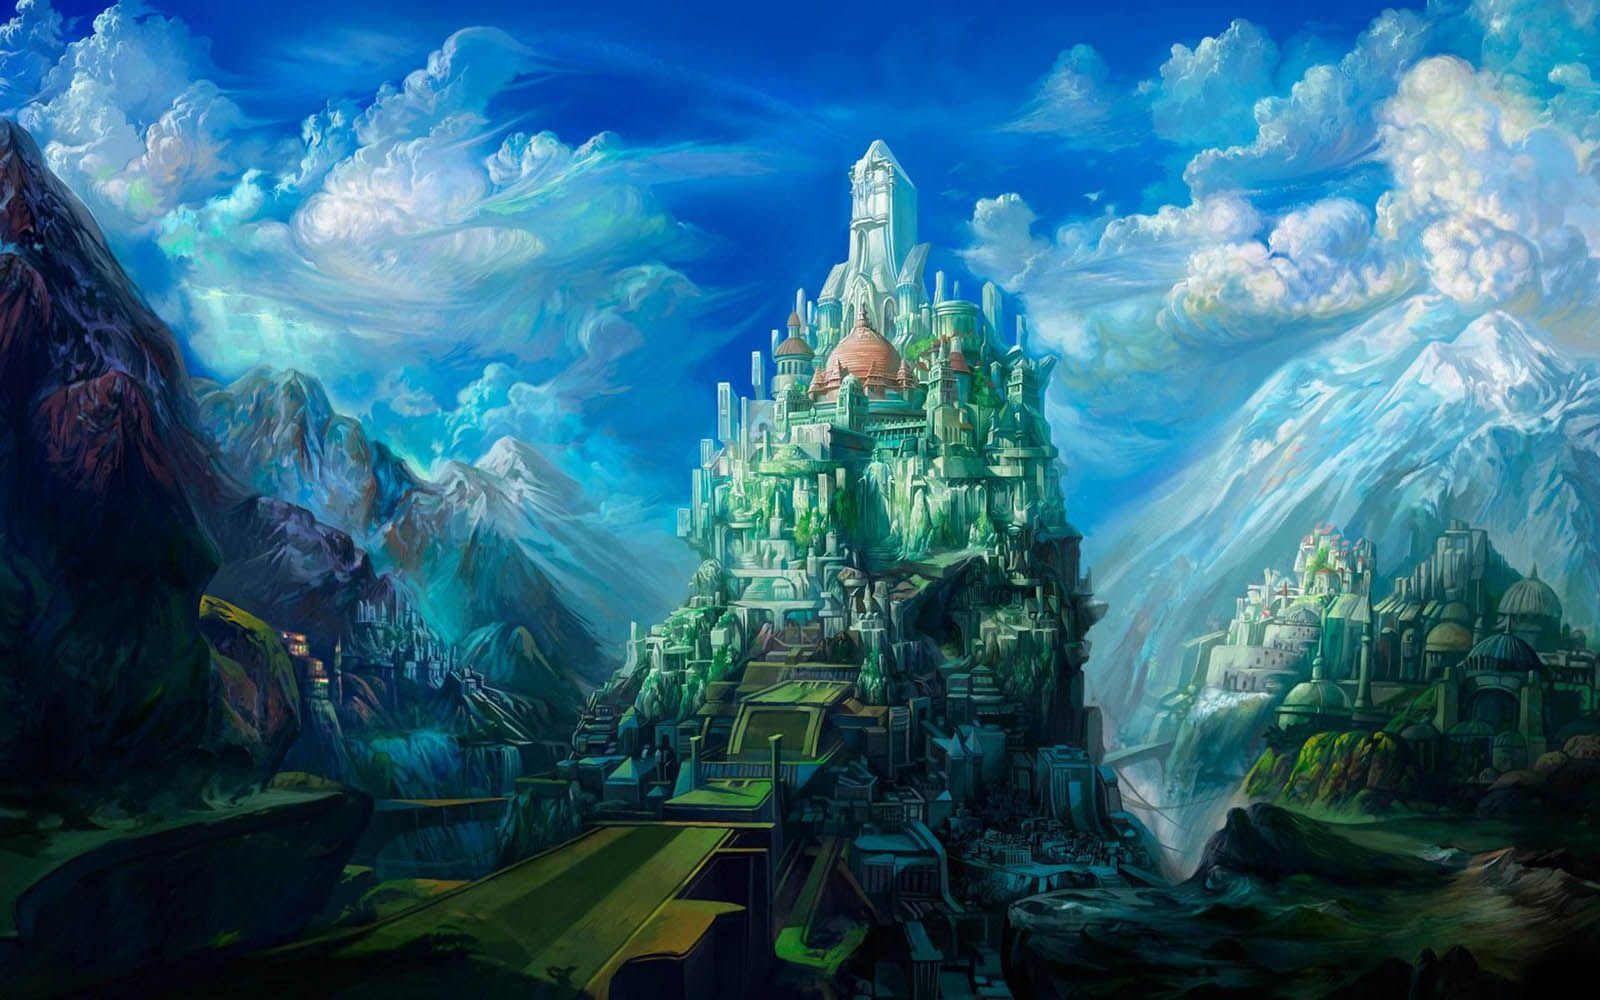 desktop backgrounds scenery desktop wallpapers fantasy art rh pinterest com